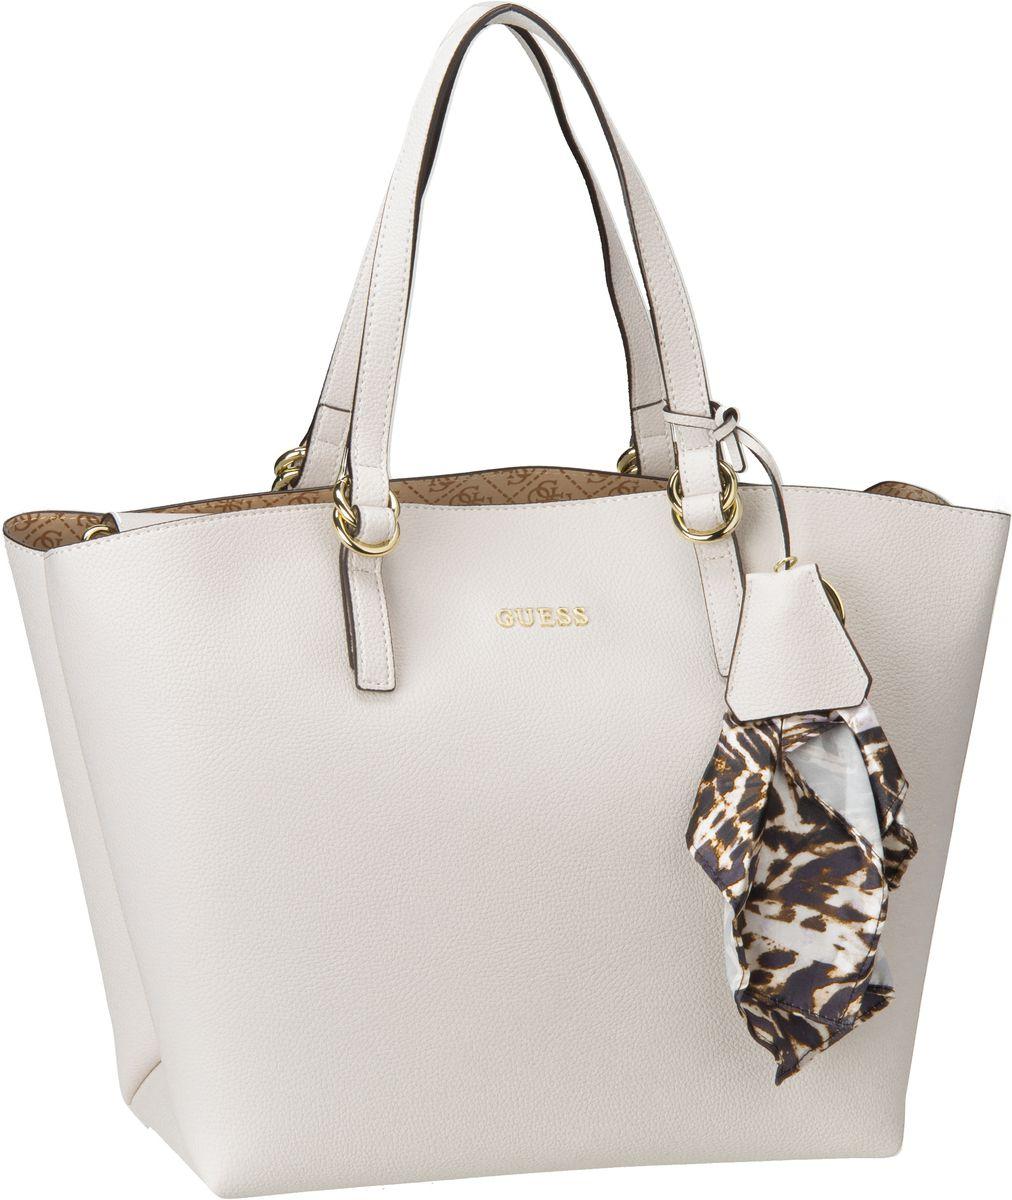 Guess Tulip Carryall White - Handtasche